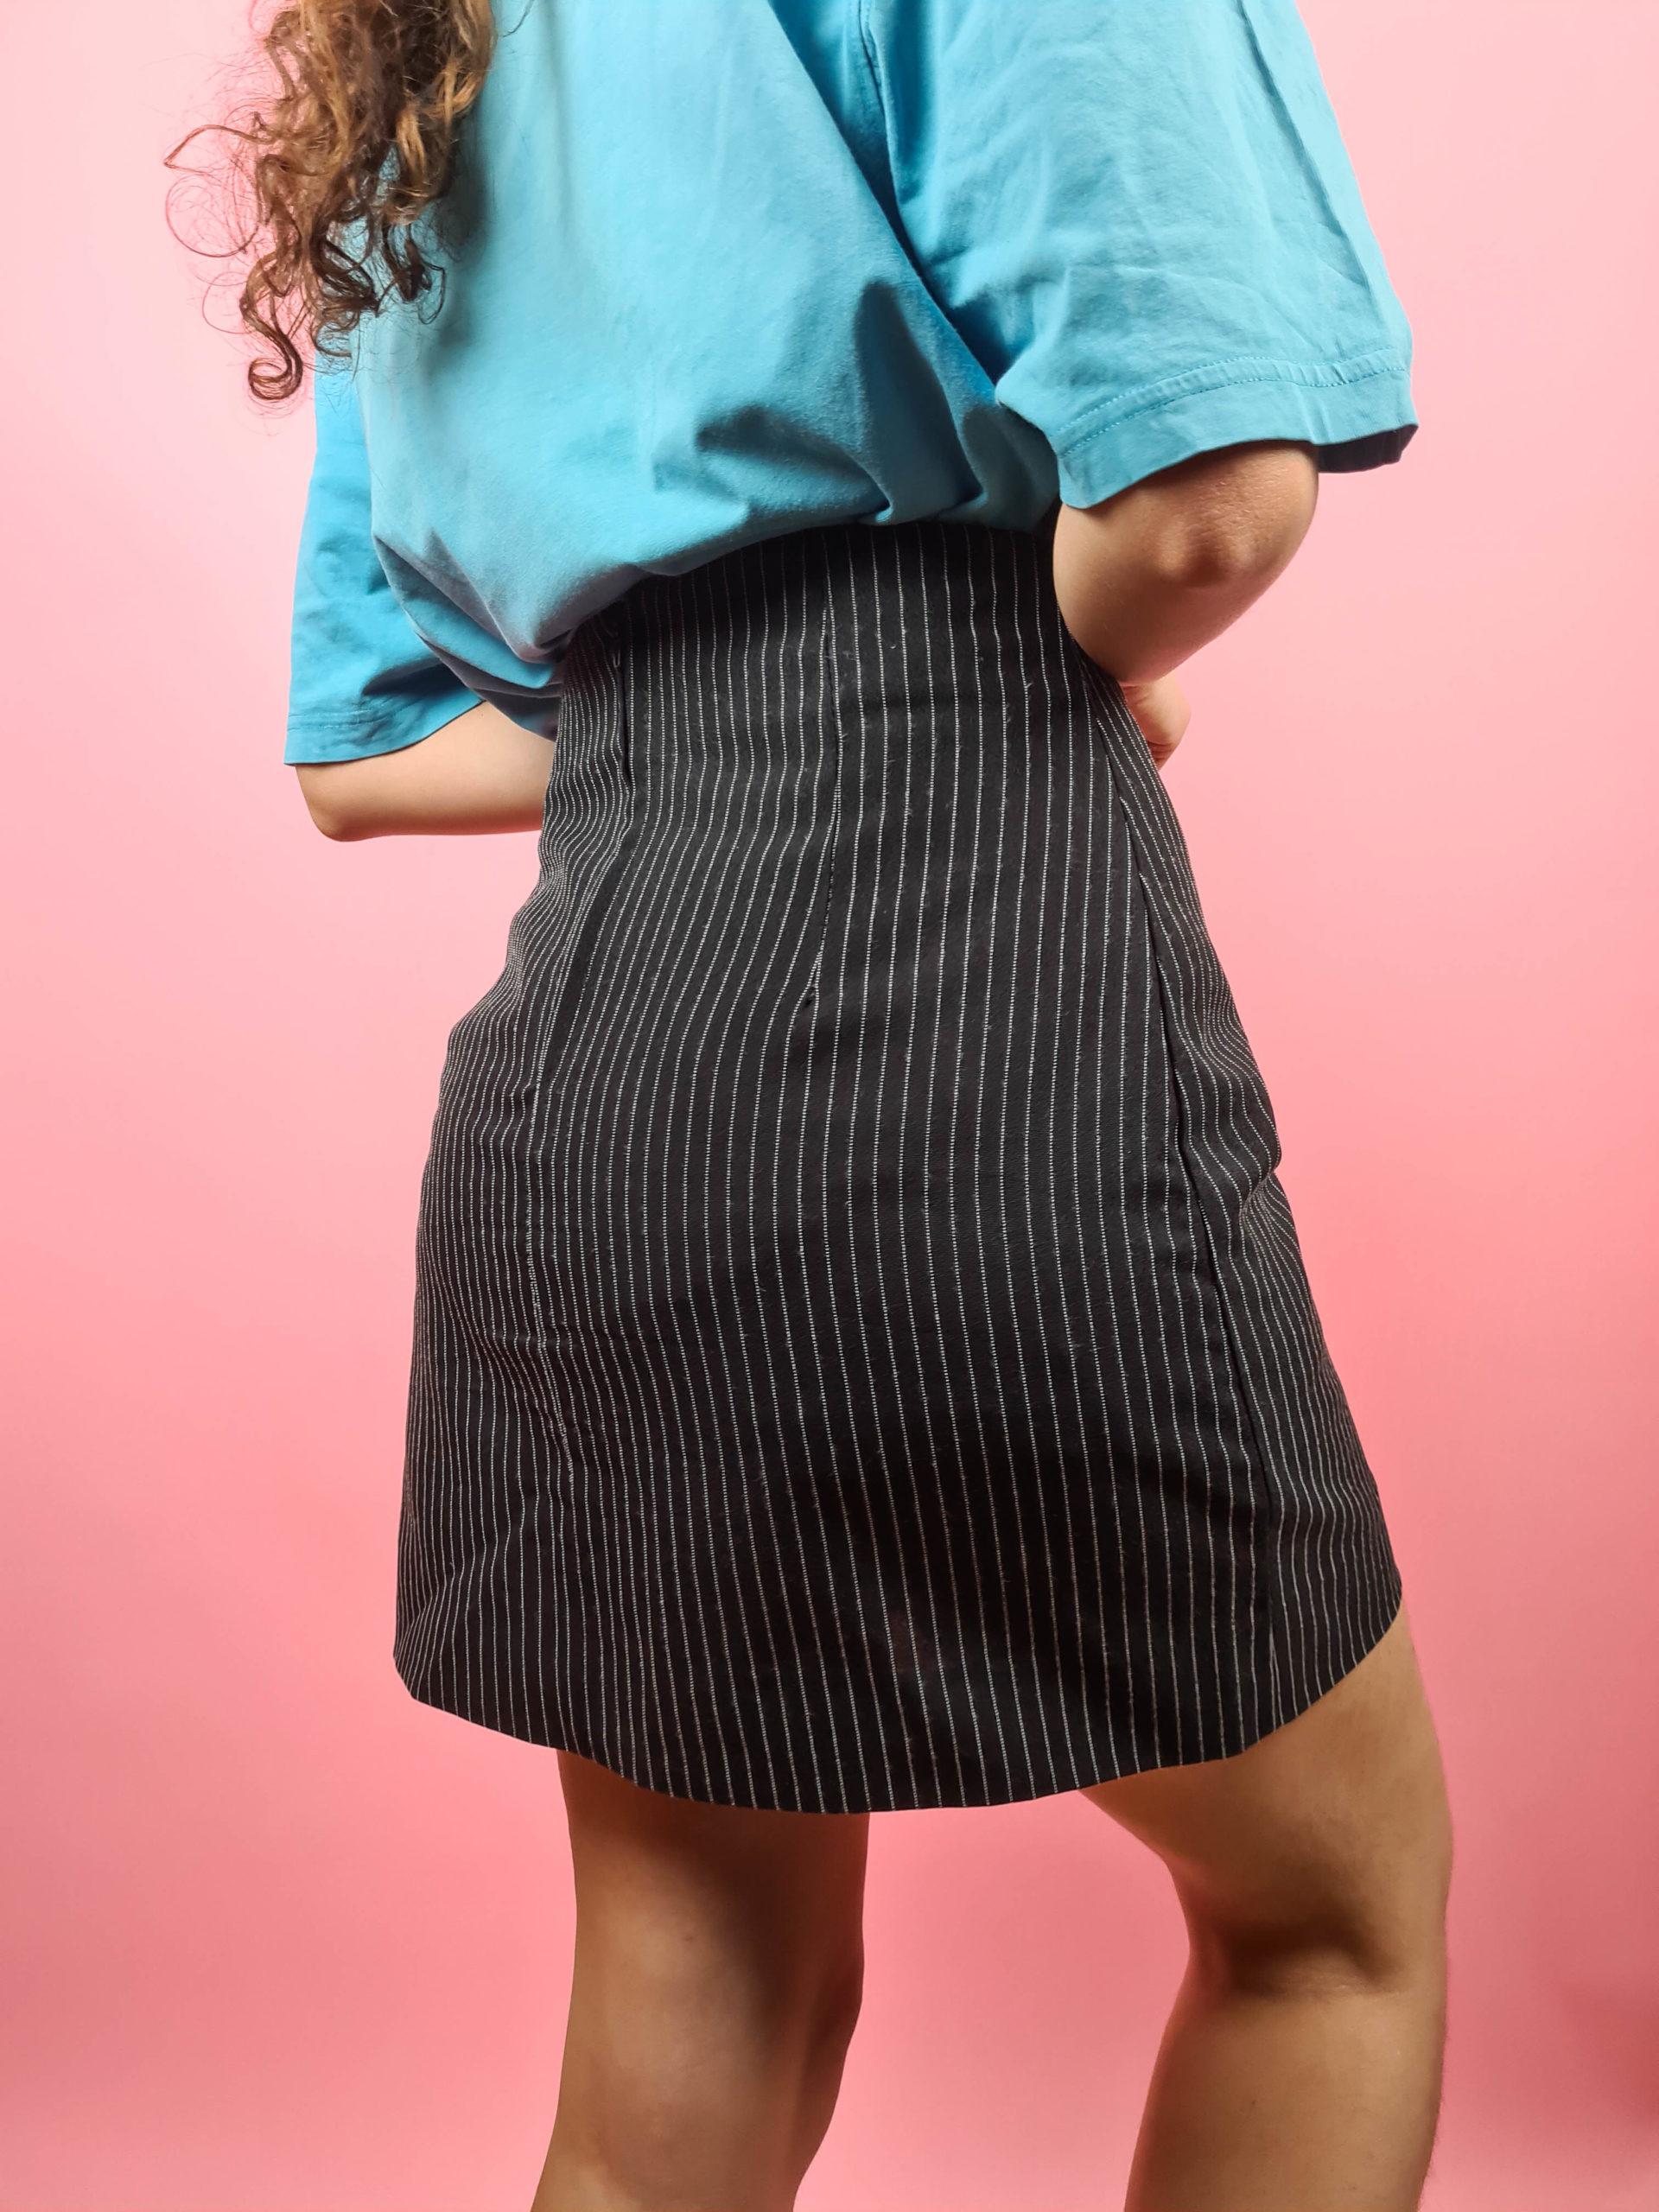 minijupe noire à rayures blanches (5)